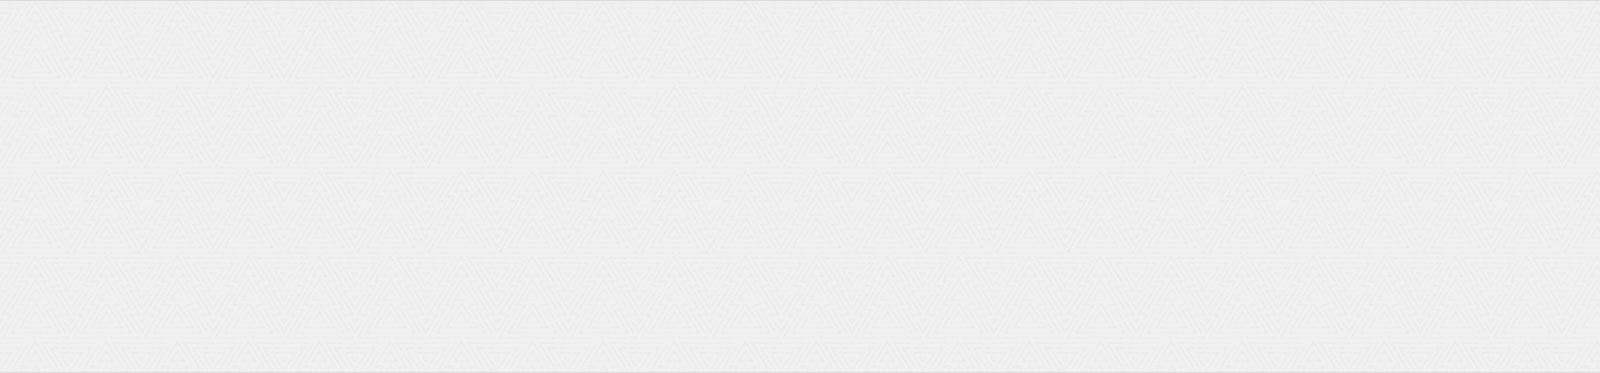 grey-rectangle.jpg